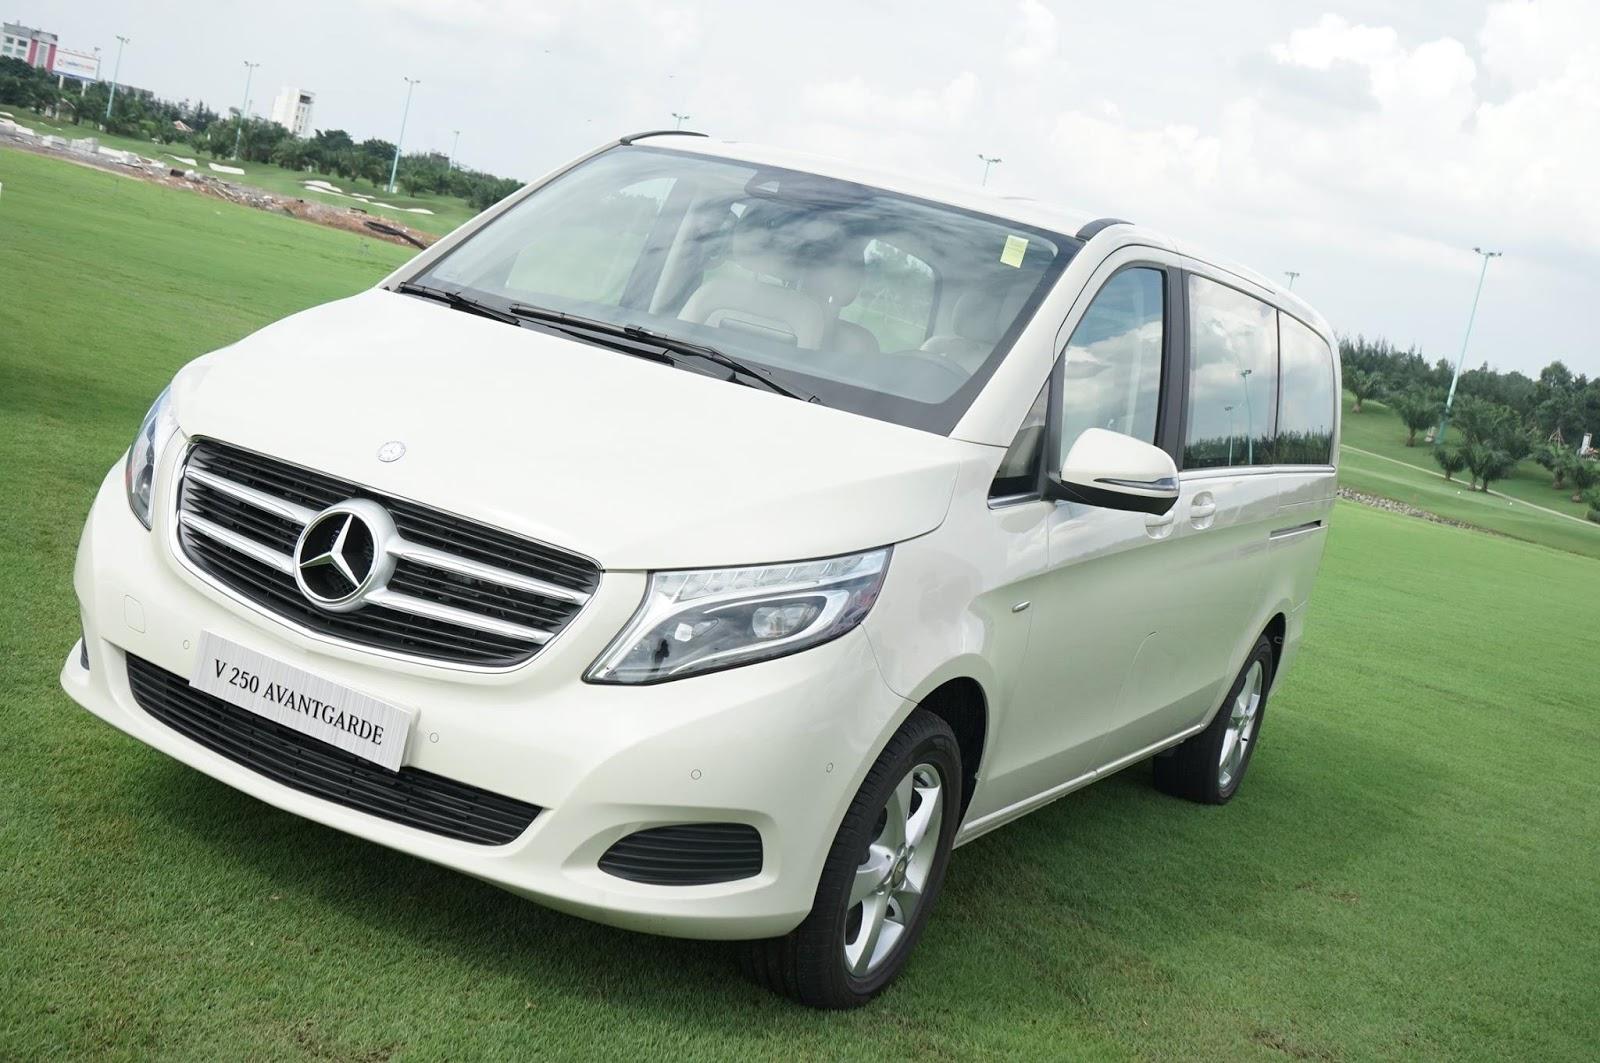 Xe Mercedes Benz V250 Avantgarde Máy Xăng màu trắng 01